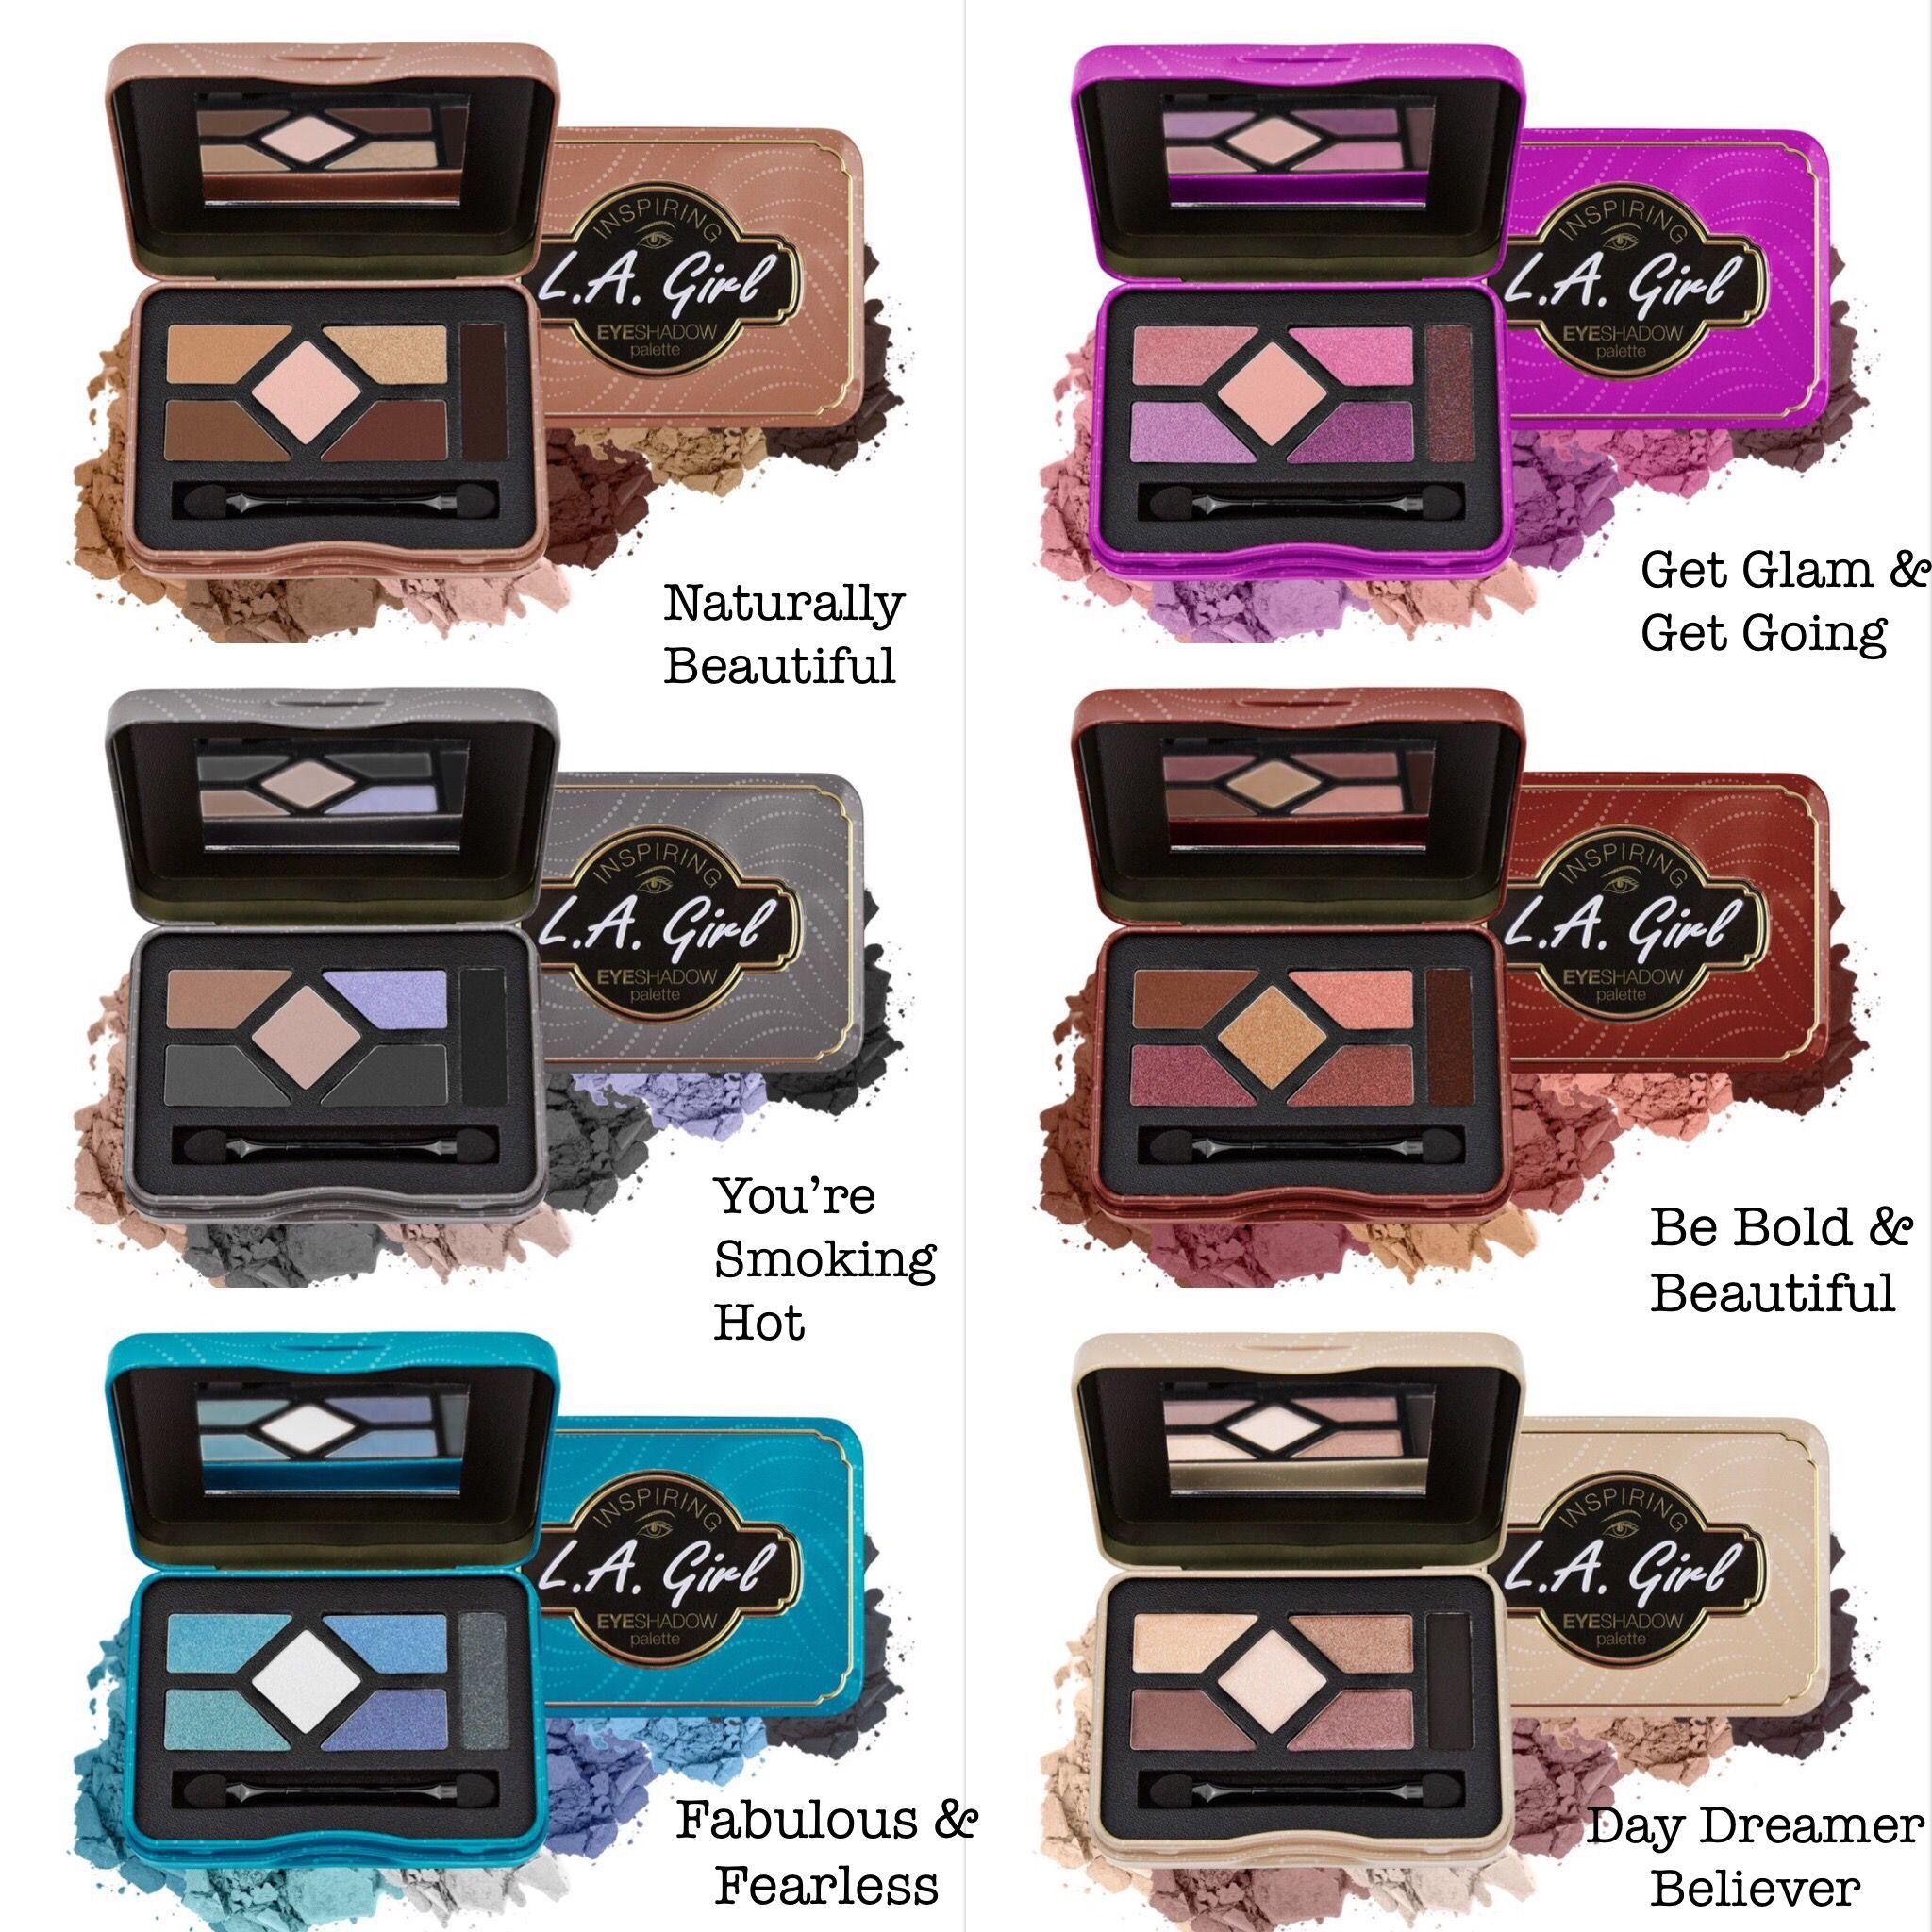 LA GIRL Inspiring Eyeshadow Palette